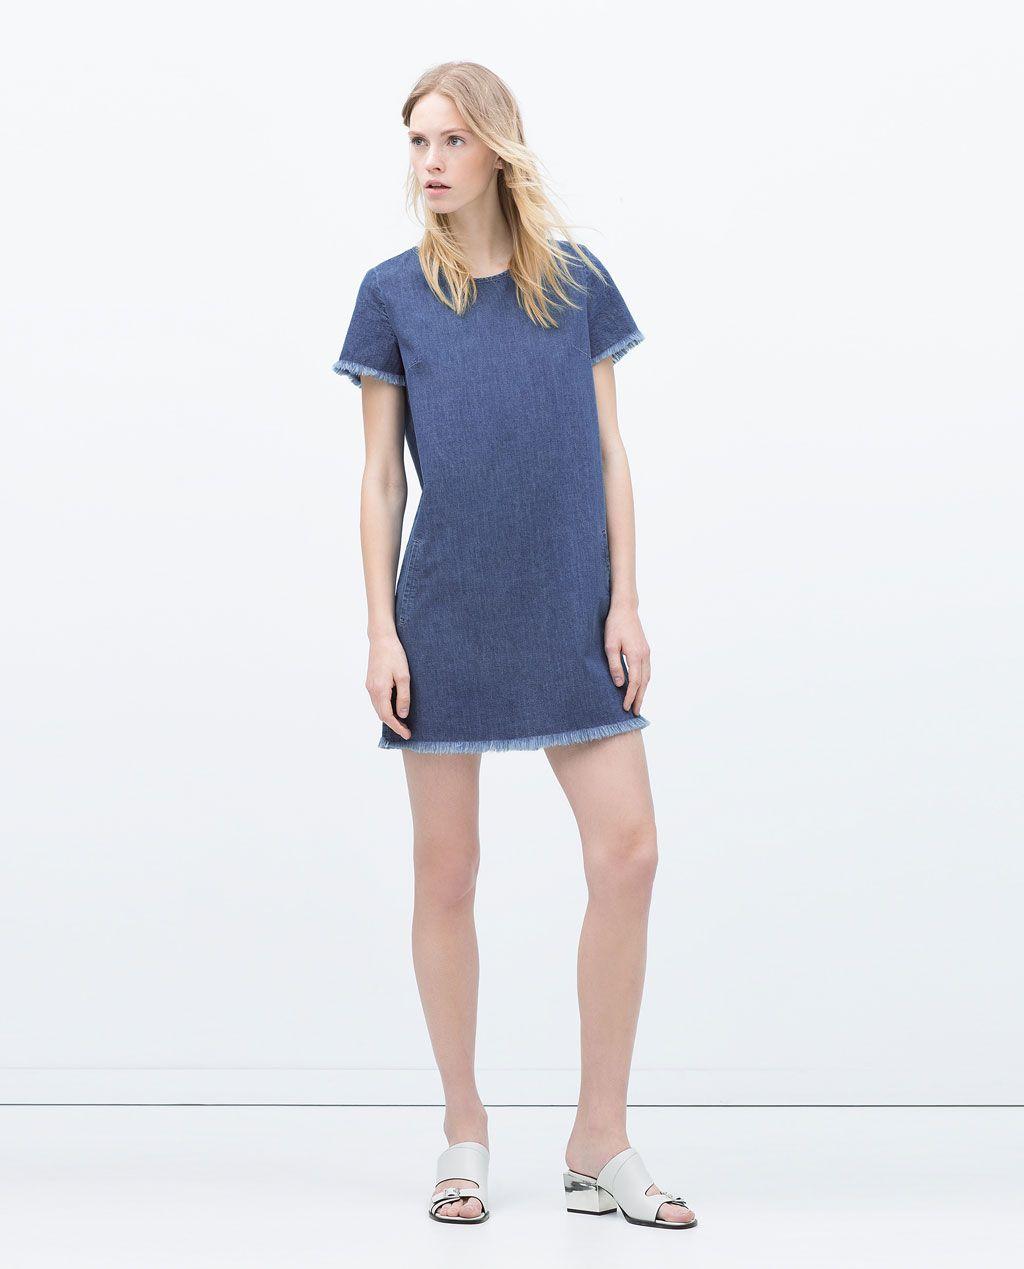 ZARA - NEW THIS WEEK - DRESS WITH FRAYED HEM